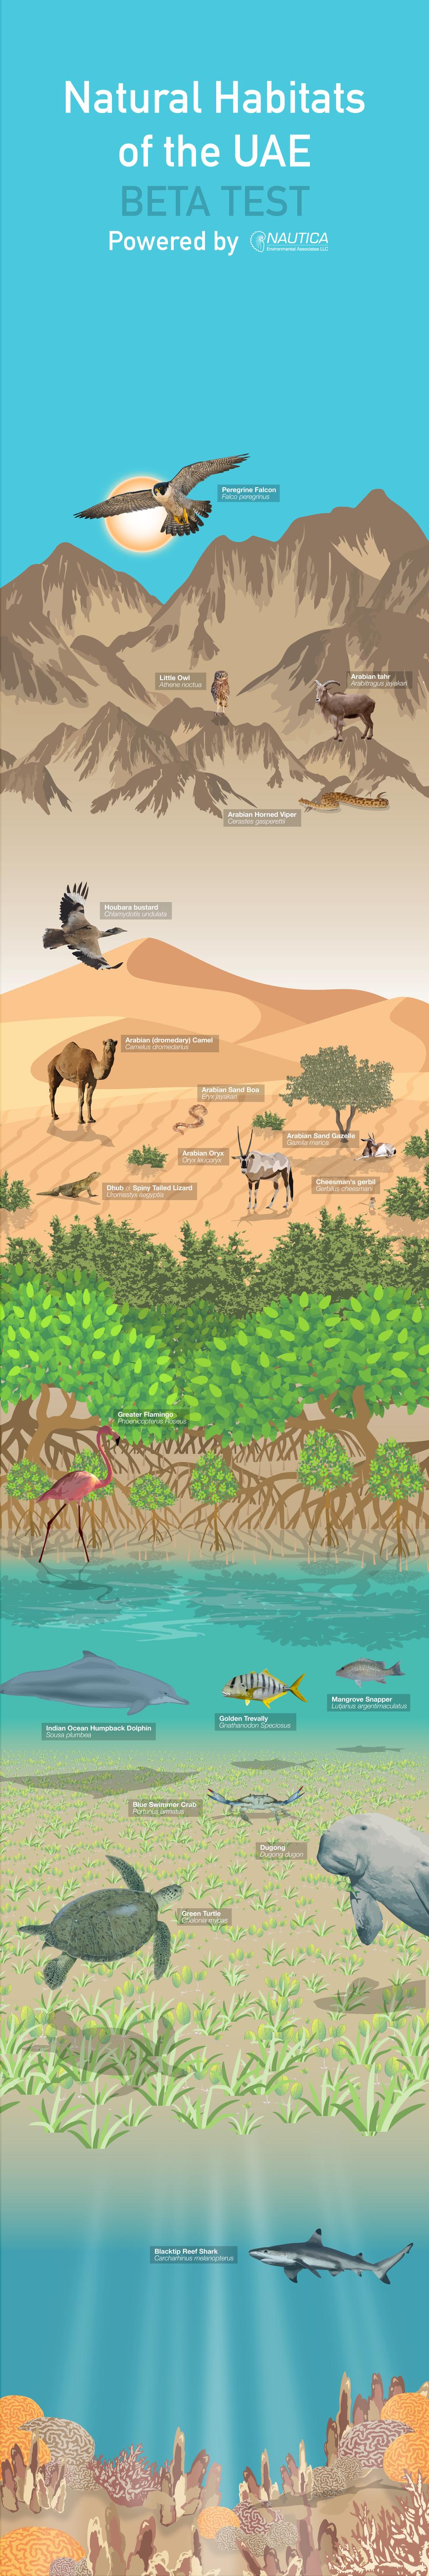 Natural Habitats of the UAE